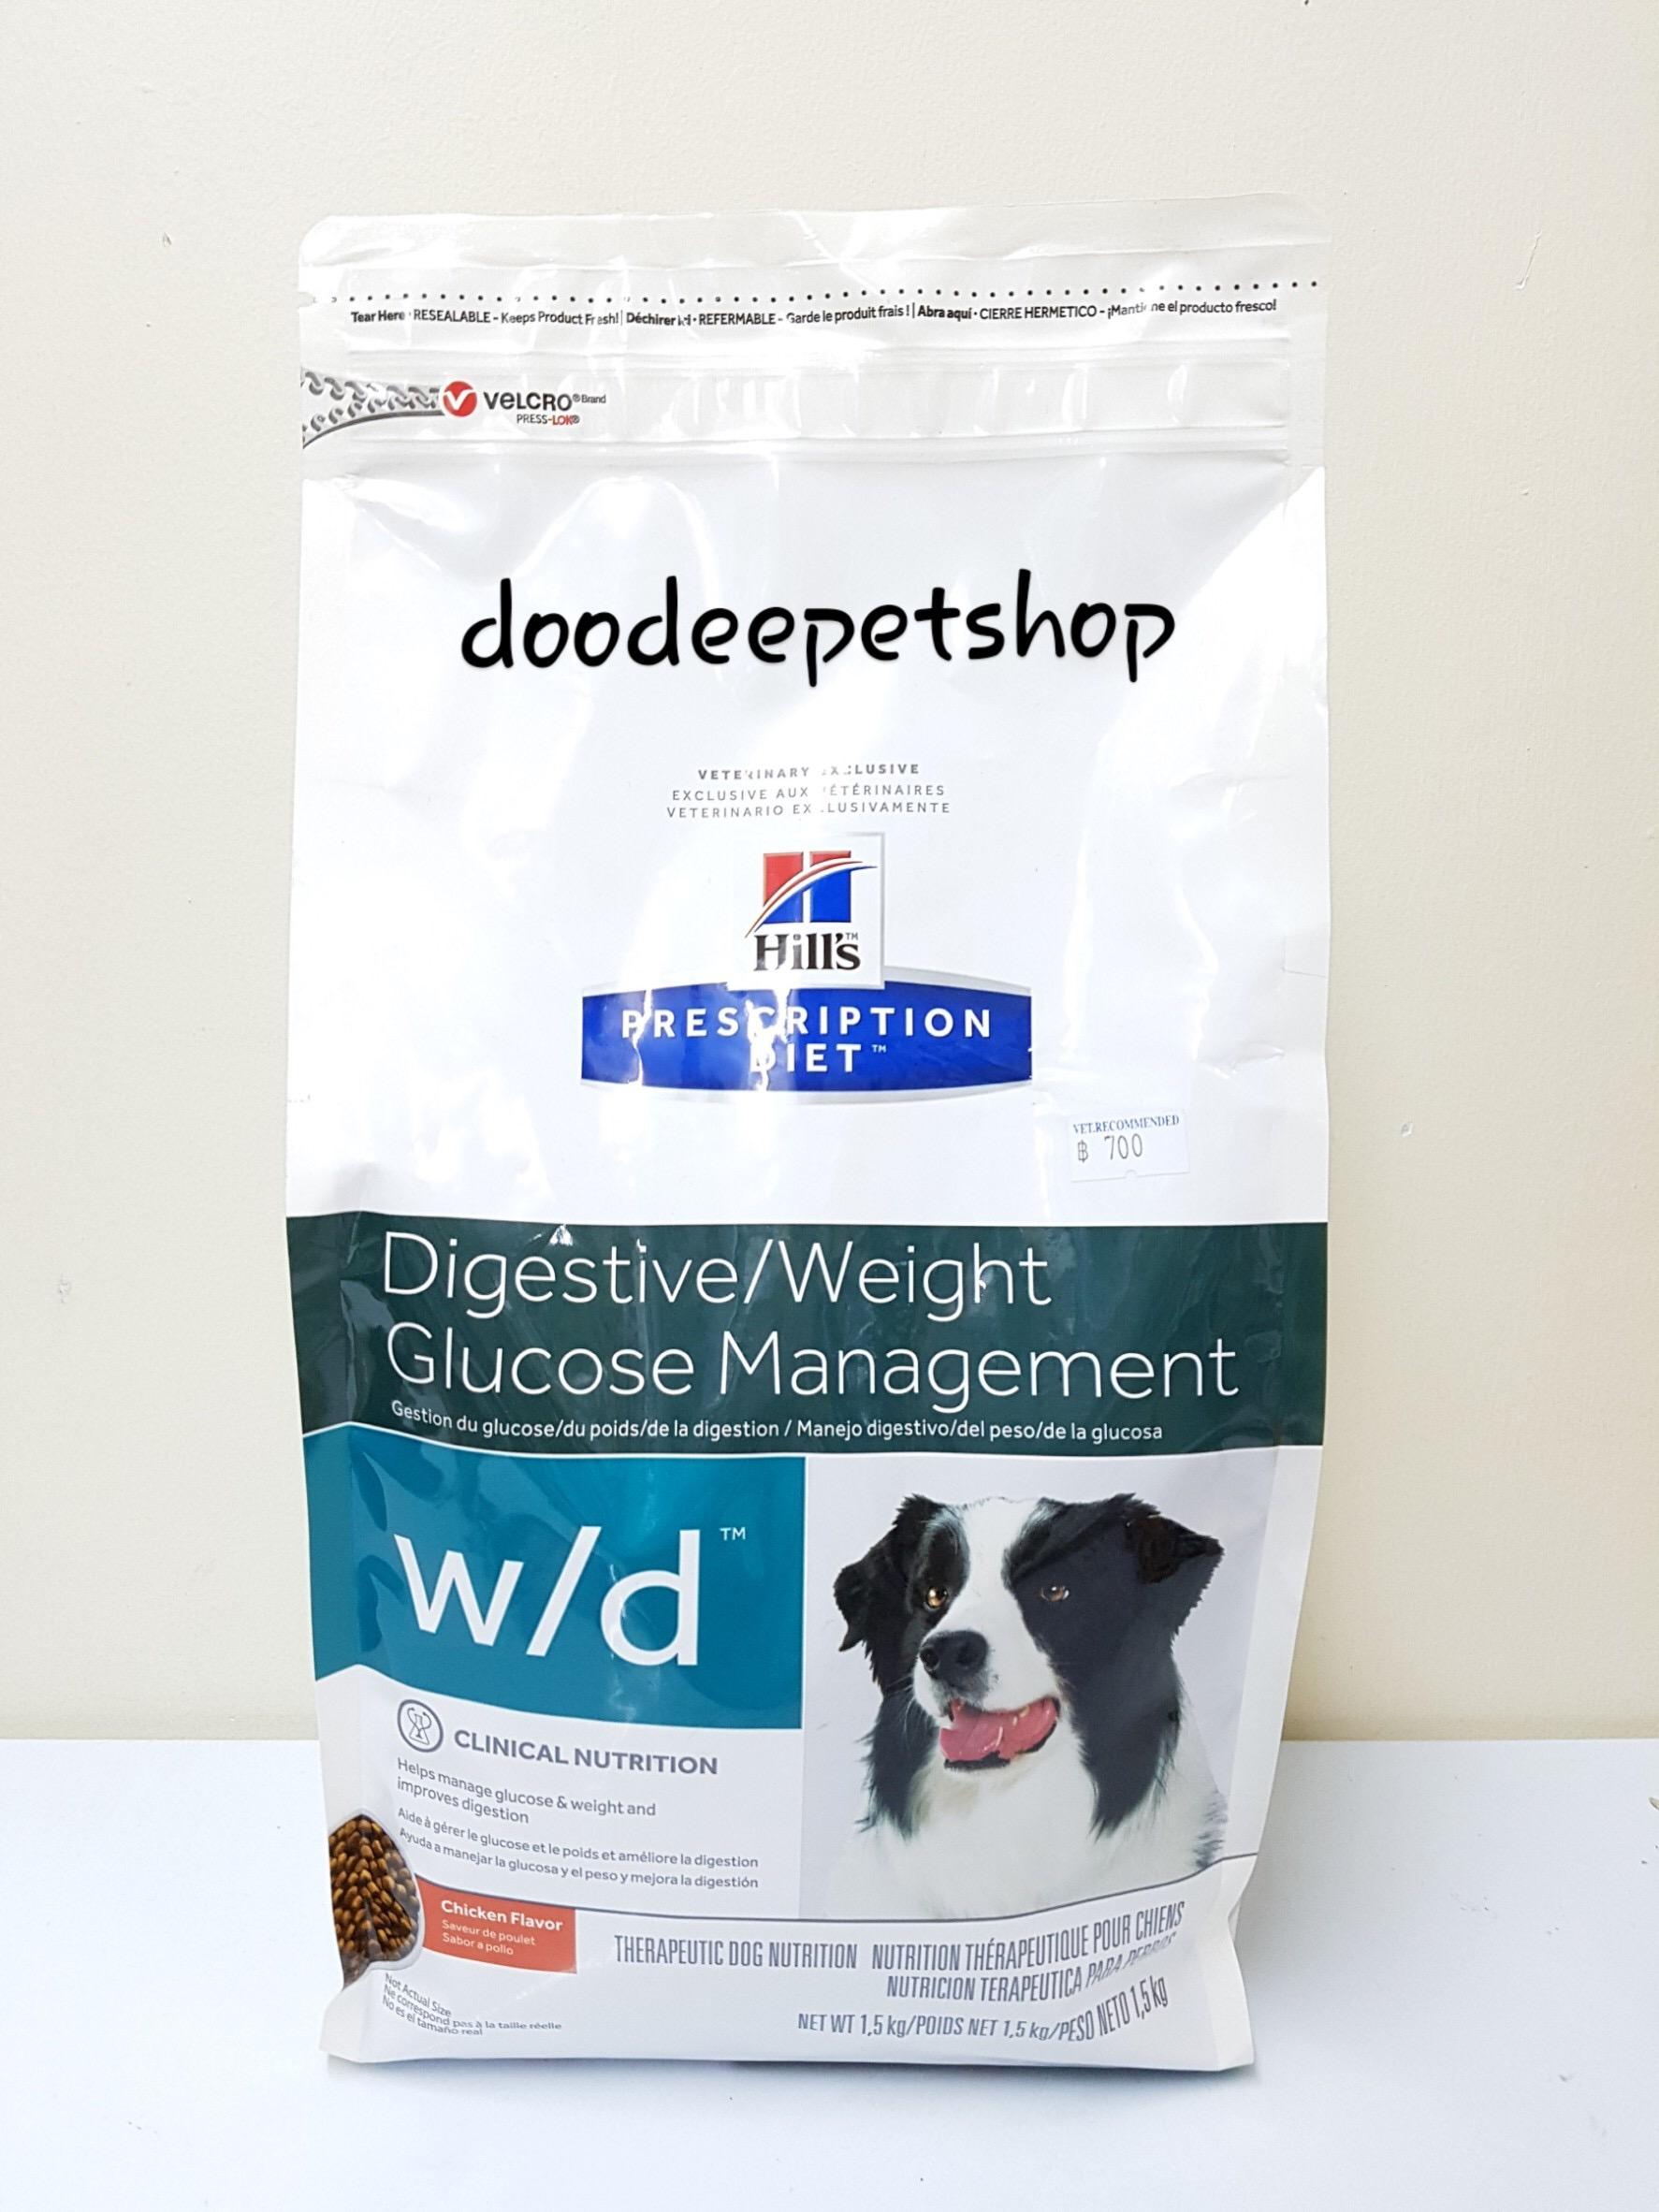 Hill's w/d canine สำหรับโรคเบาหวานและควบคุมน้ำหนัก ขนาด 5.5 kg. Exp.09/18